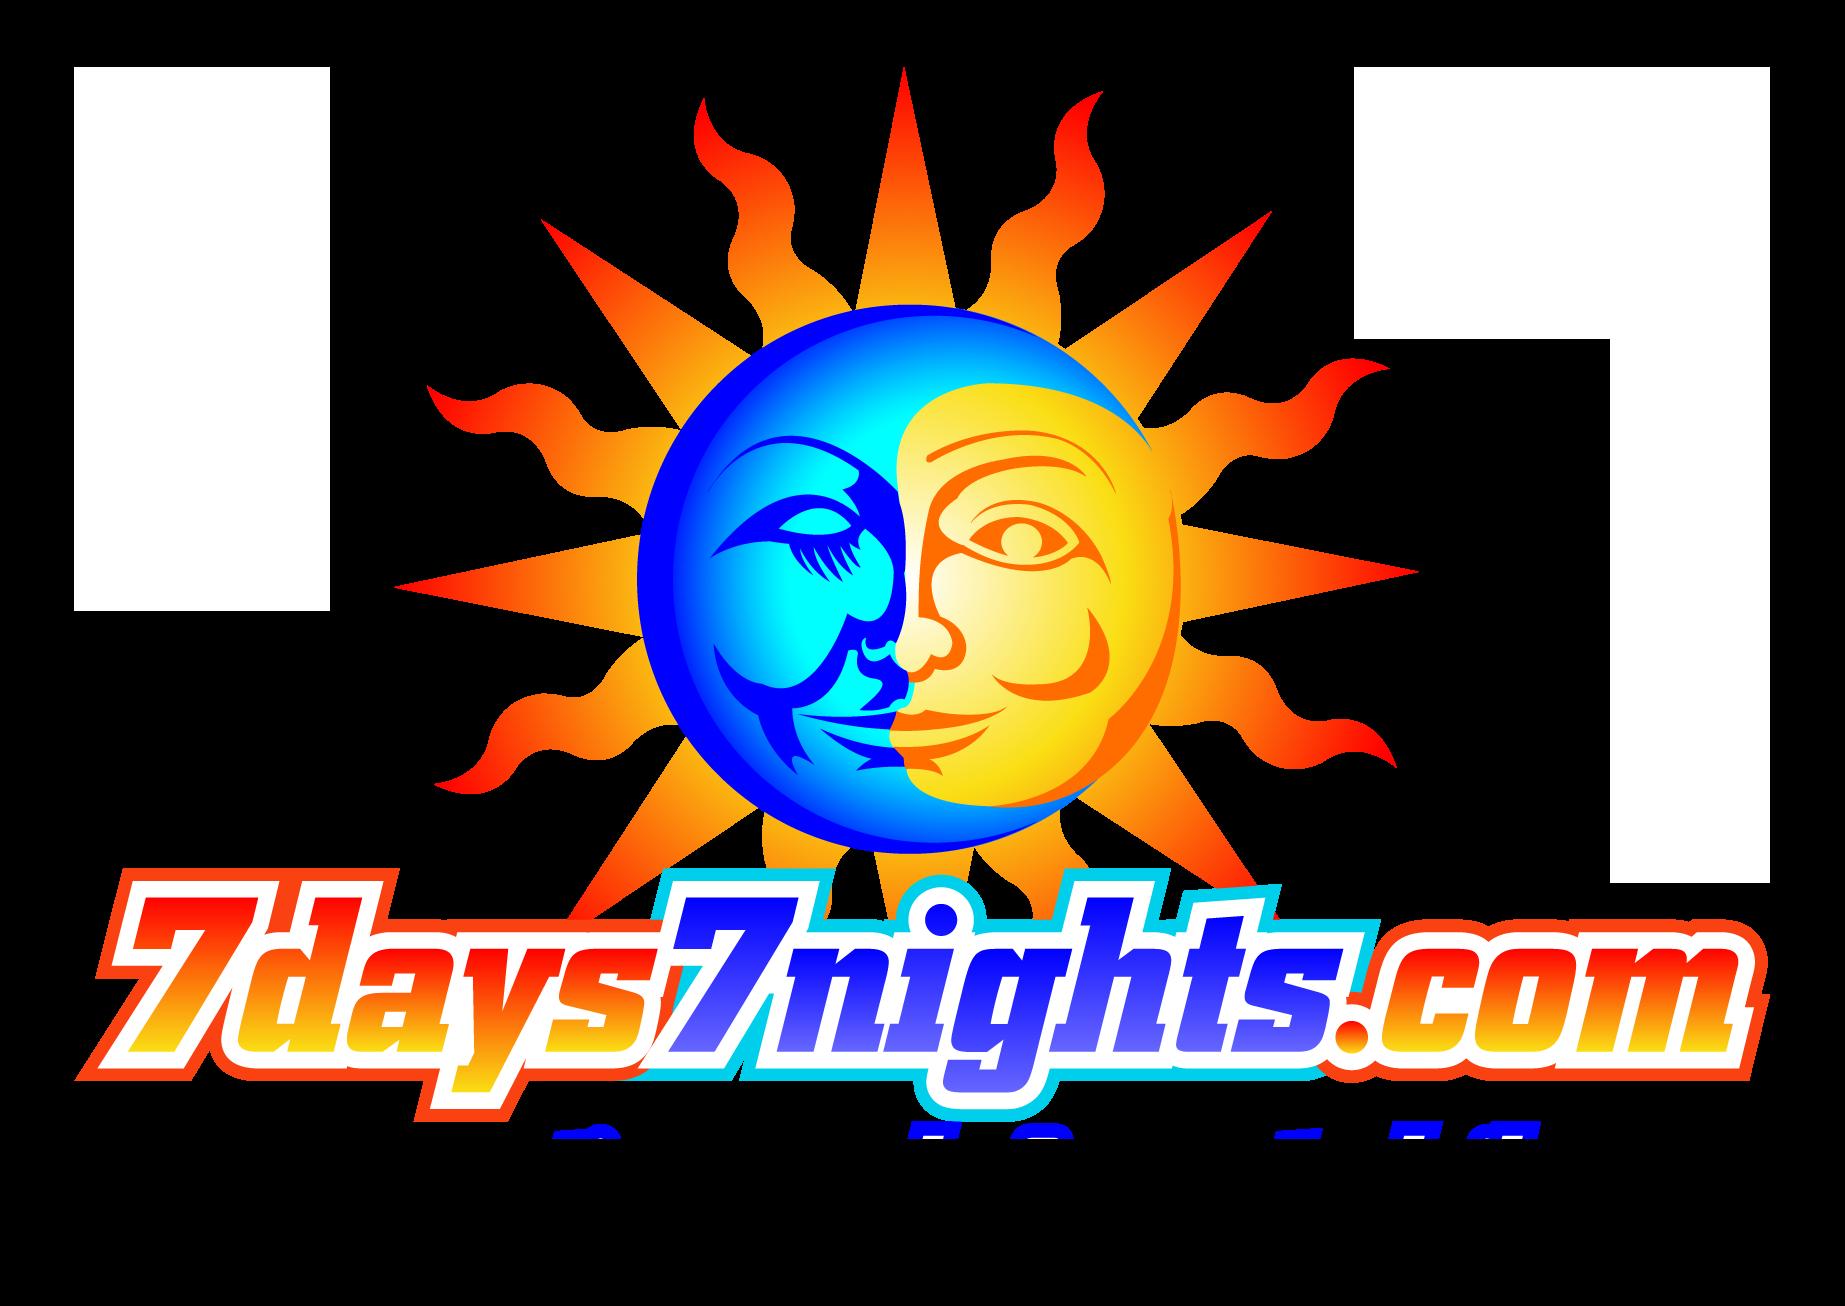 7days7nights